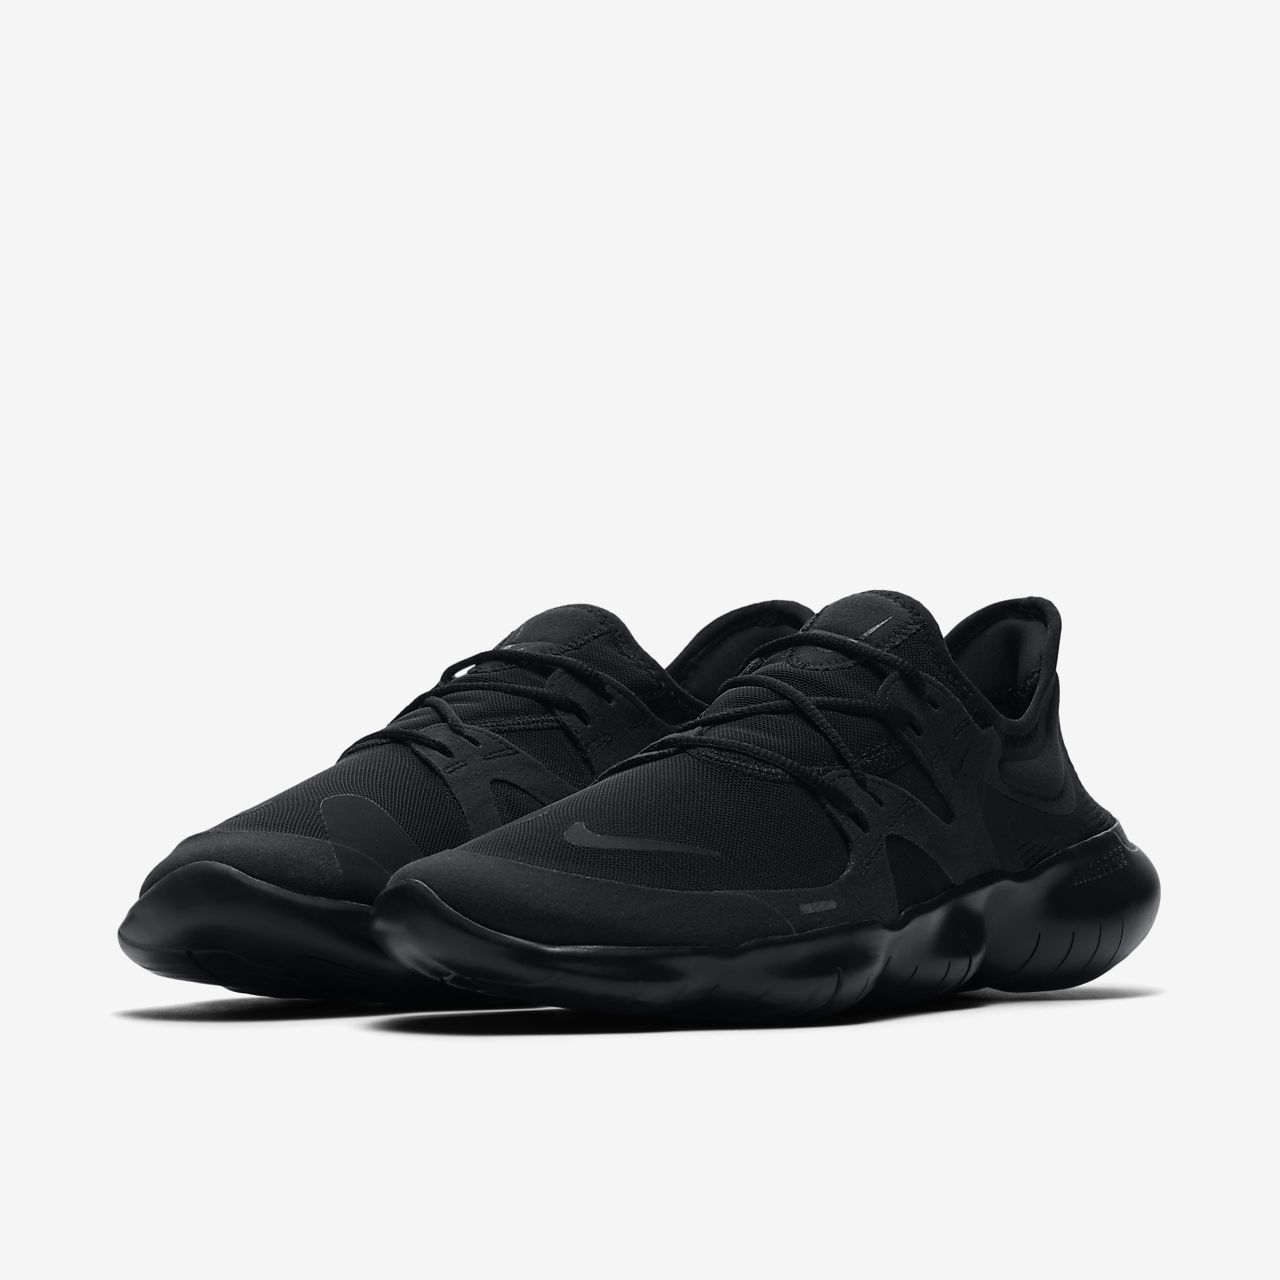 Nike Free 5.0 Mens | Nike Free Running Shoes Australia